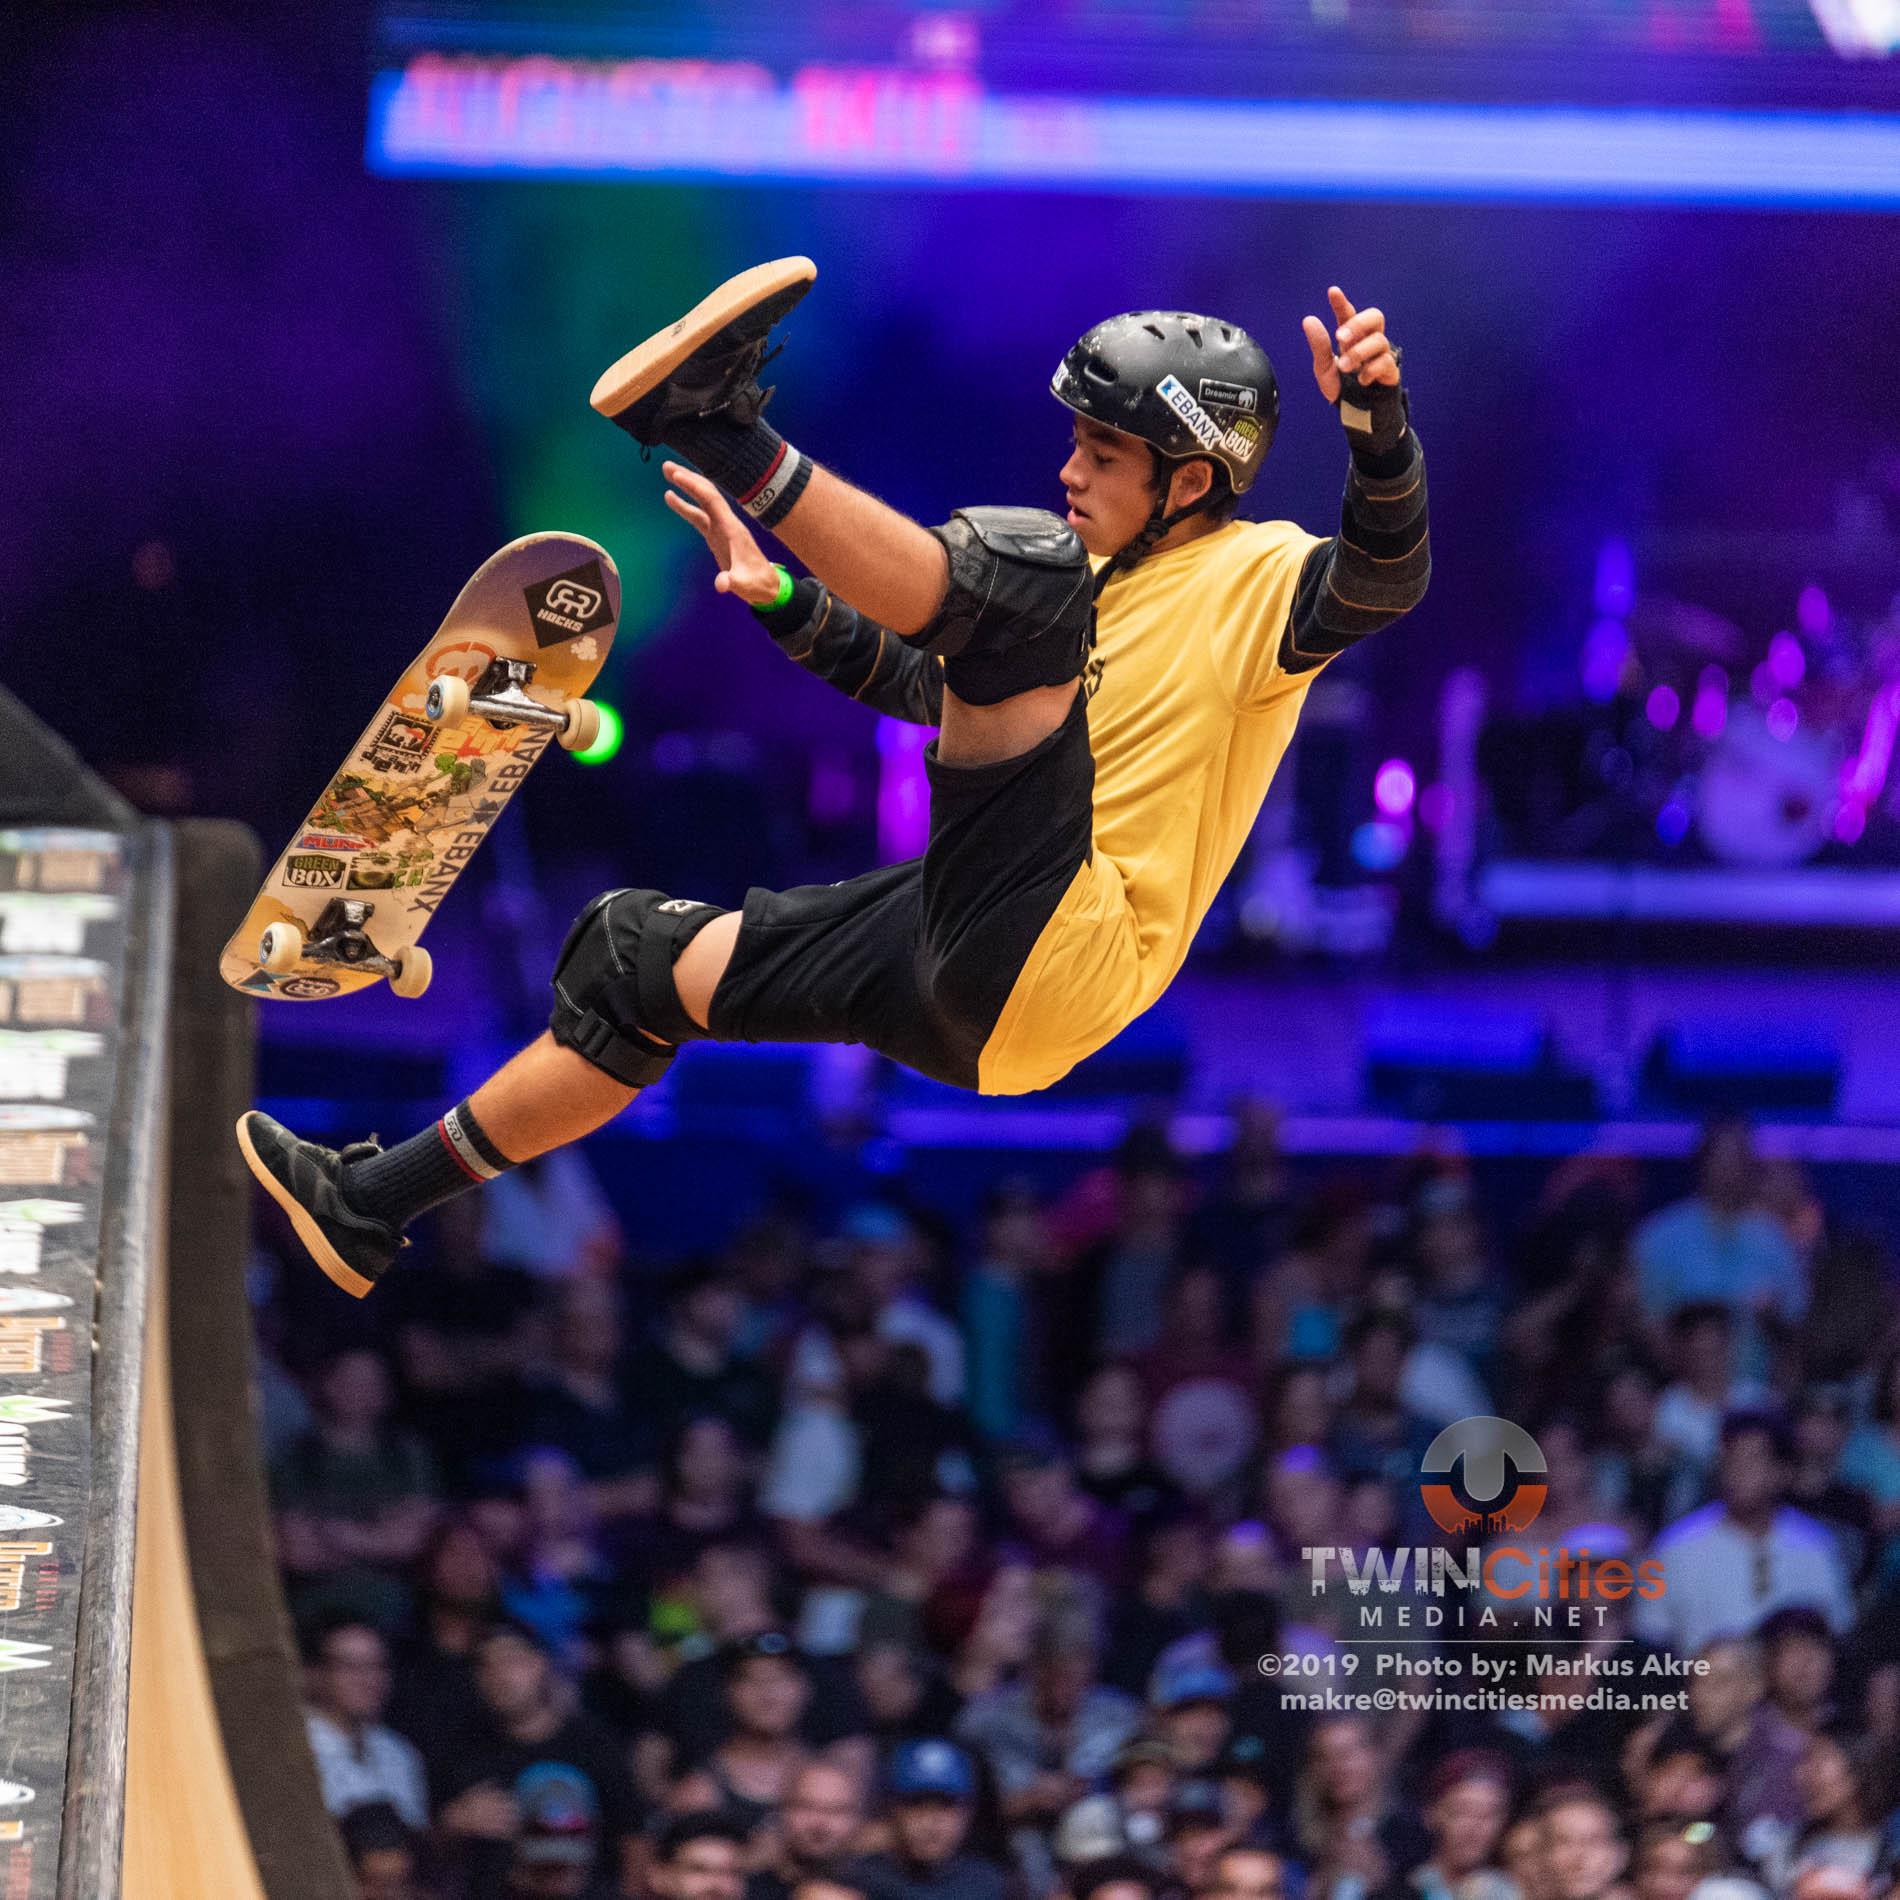 2019-X-Games-Day-1-Skateboard-Vert-13